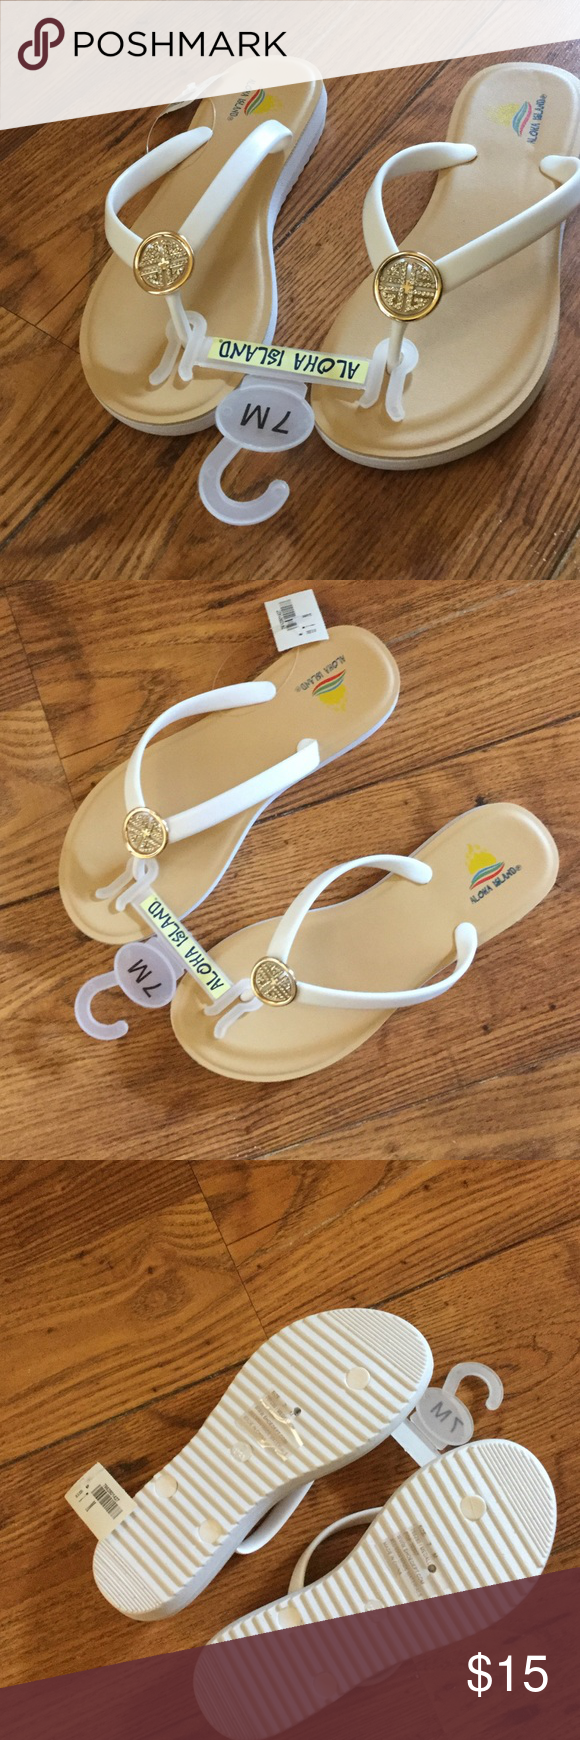 311afd9026ff8 NWT white diamond Aloha Island Sandals. BRAND NEW! Authentic Aloha Island  Sandals Flip